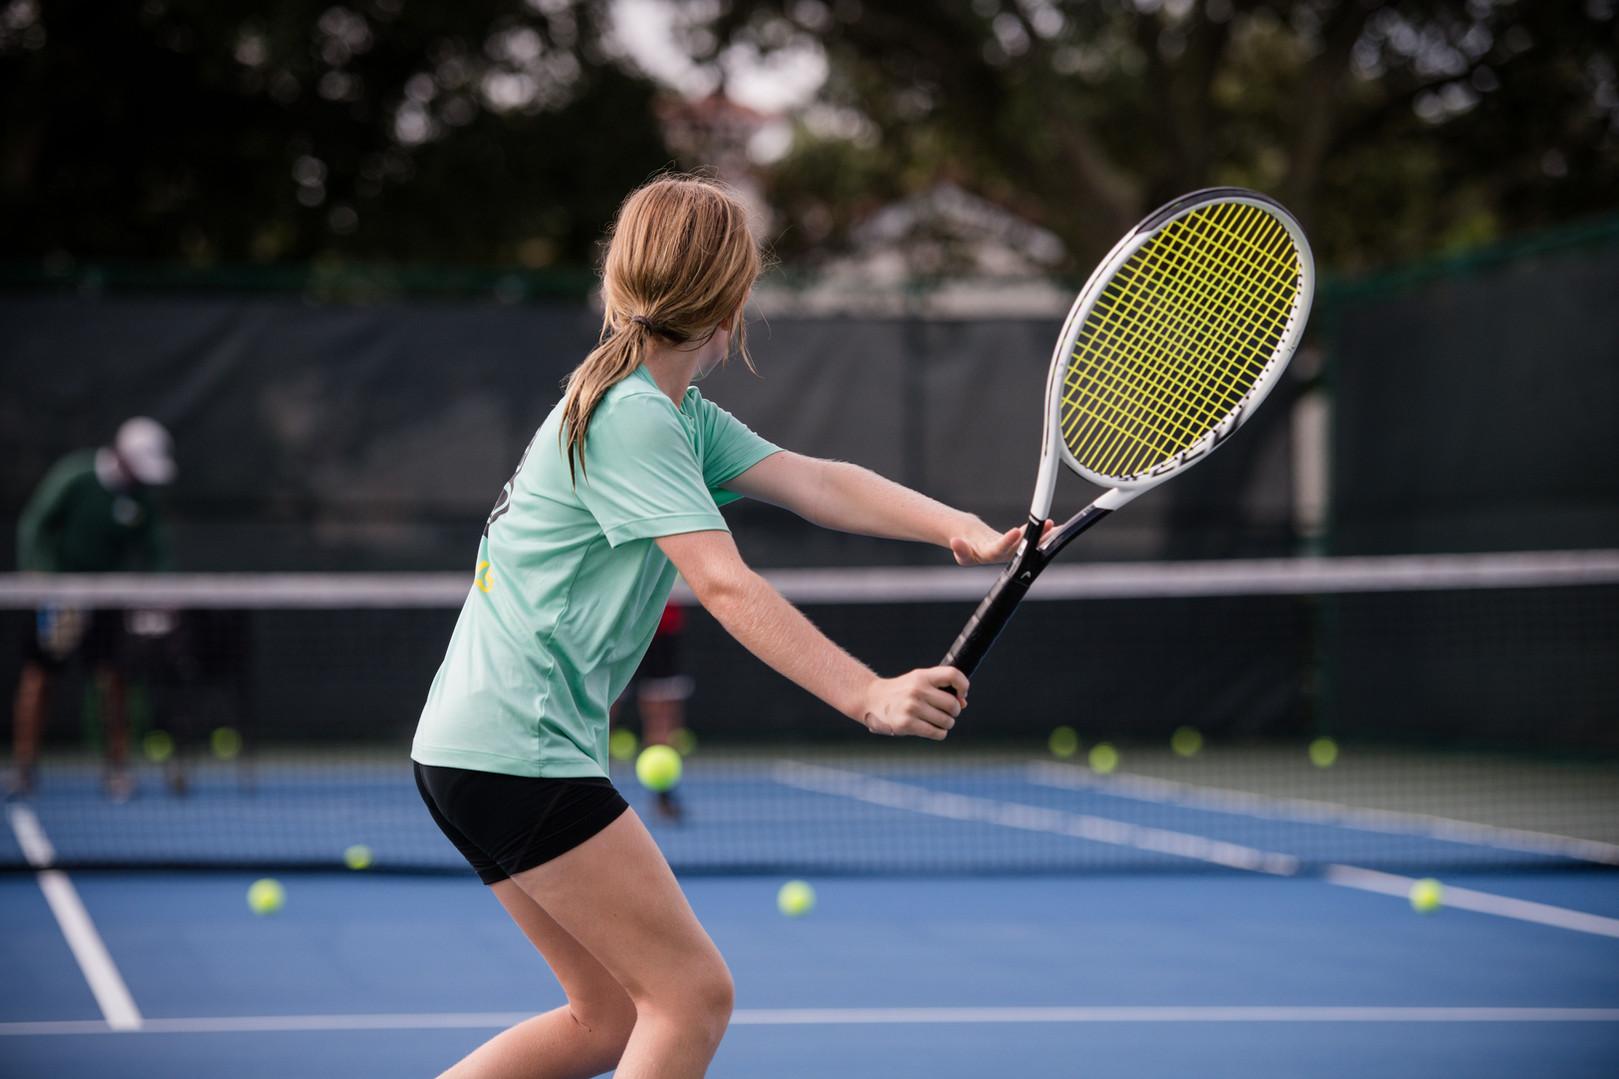 Tennis_Youth_20200724_0706.jpg